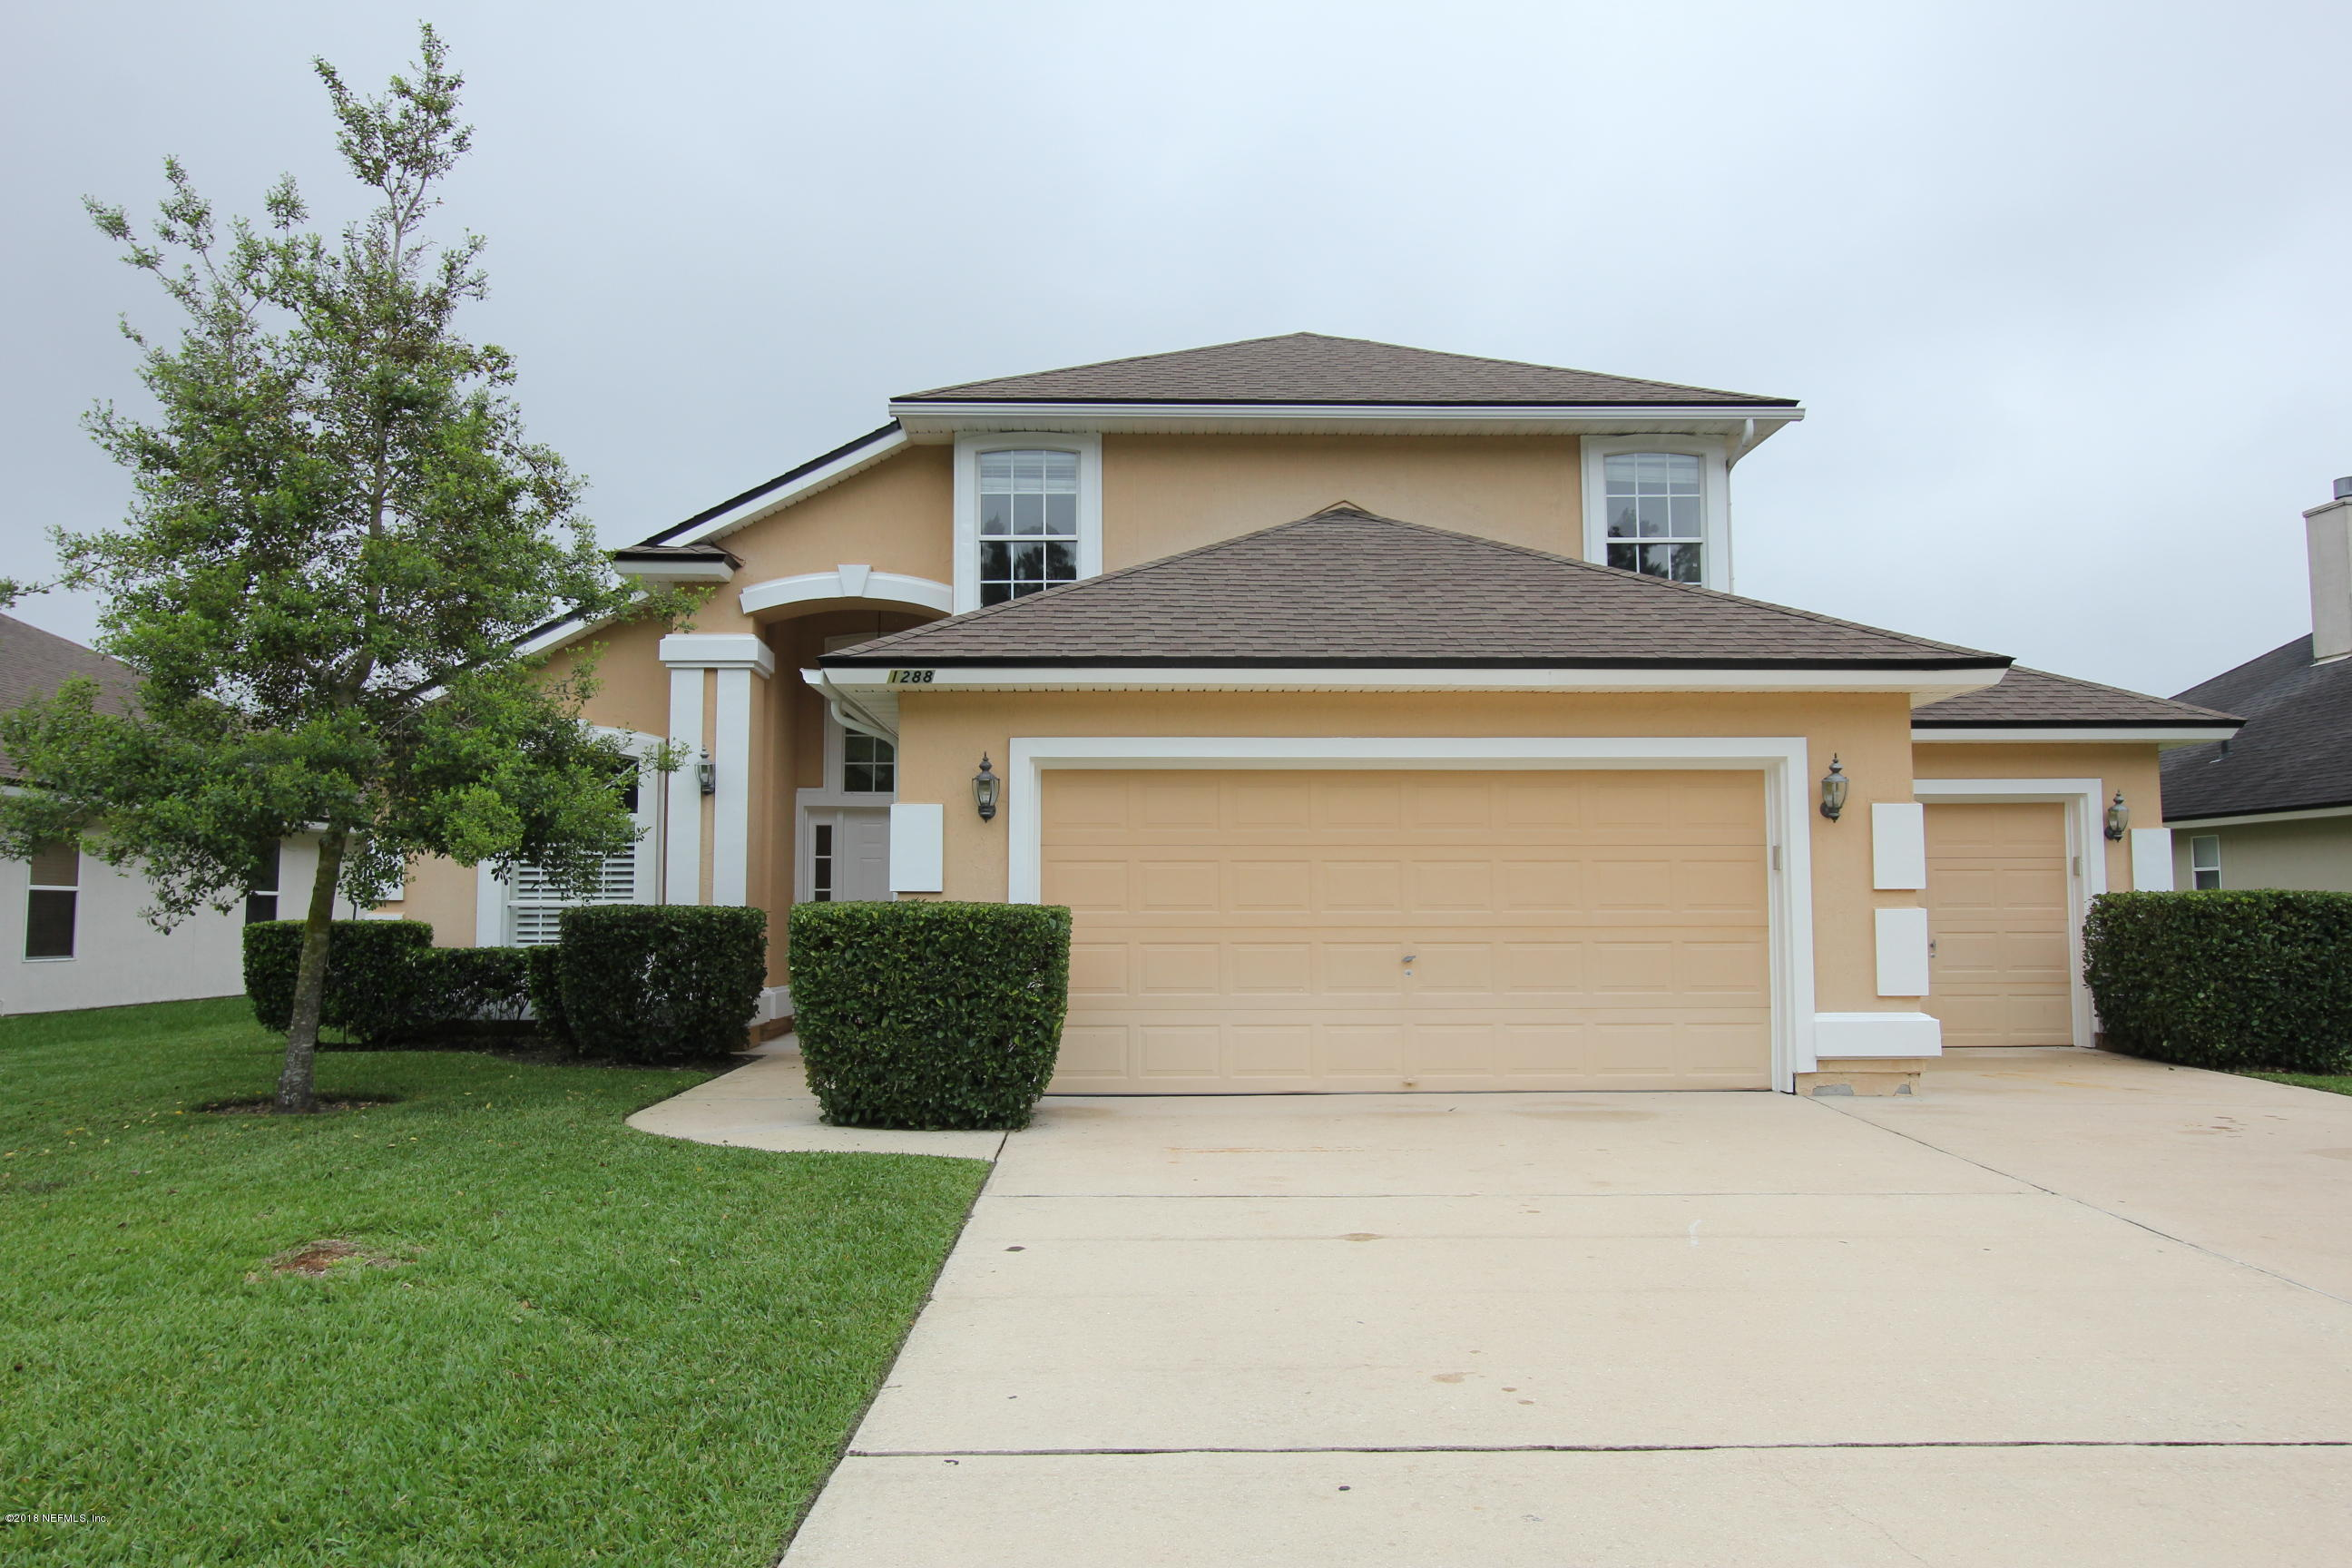 1288 LOCH TANNA, ST JOHNS, FLORIDA 32259, 4 Bedrooms Bedrooms, ,2 BathroomsBathrooms,Residential - single family,For sale,LOCH TANNA,967492